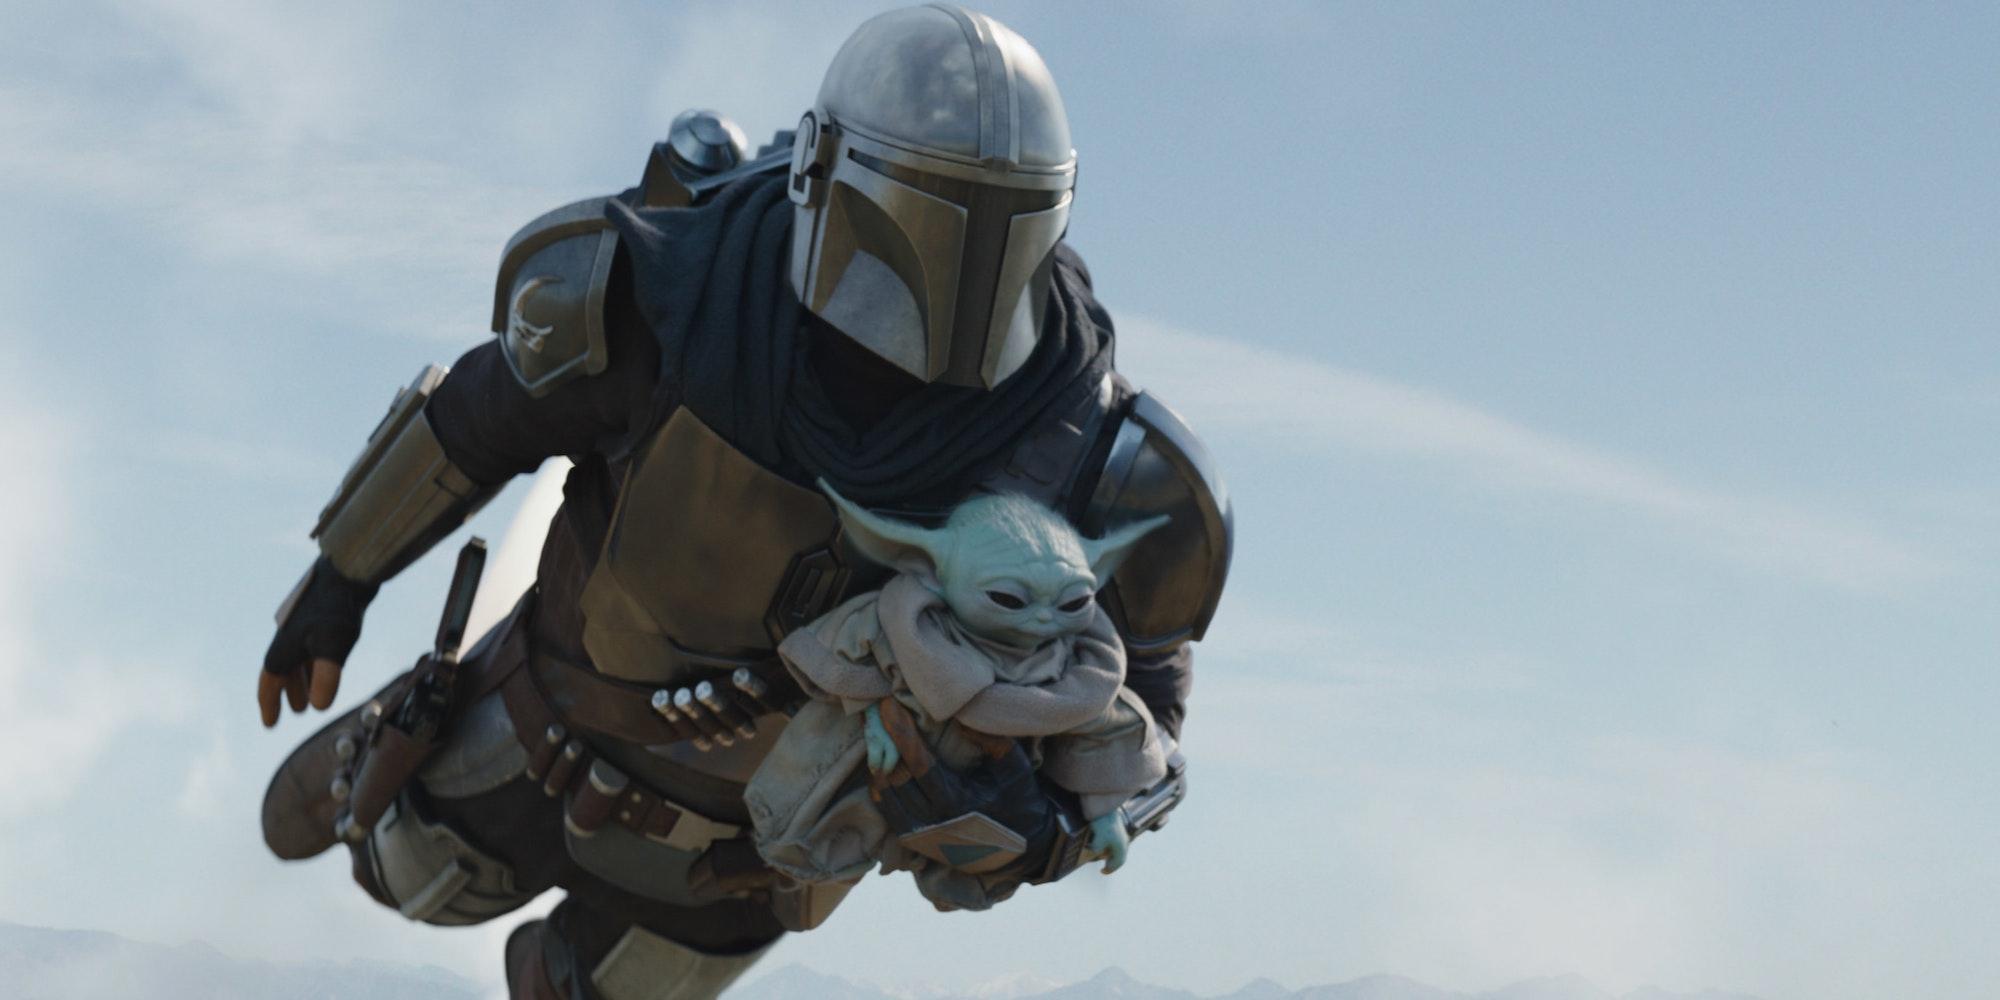 A 'Star Wars' fan favorite makes a bold return on 'The Mandalorian'